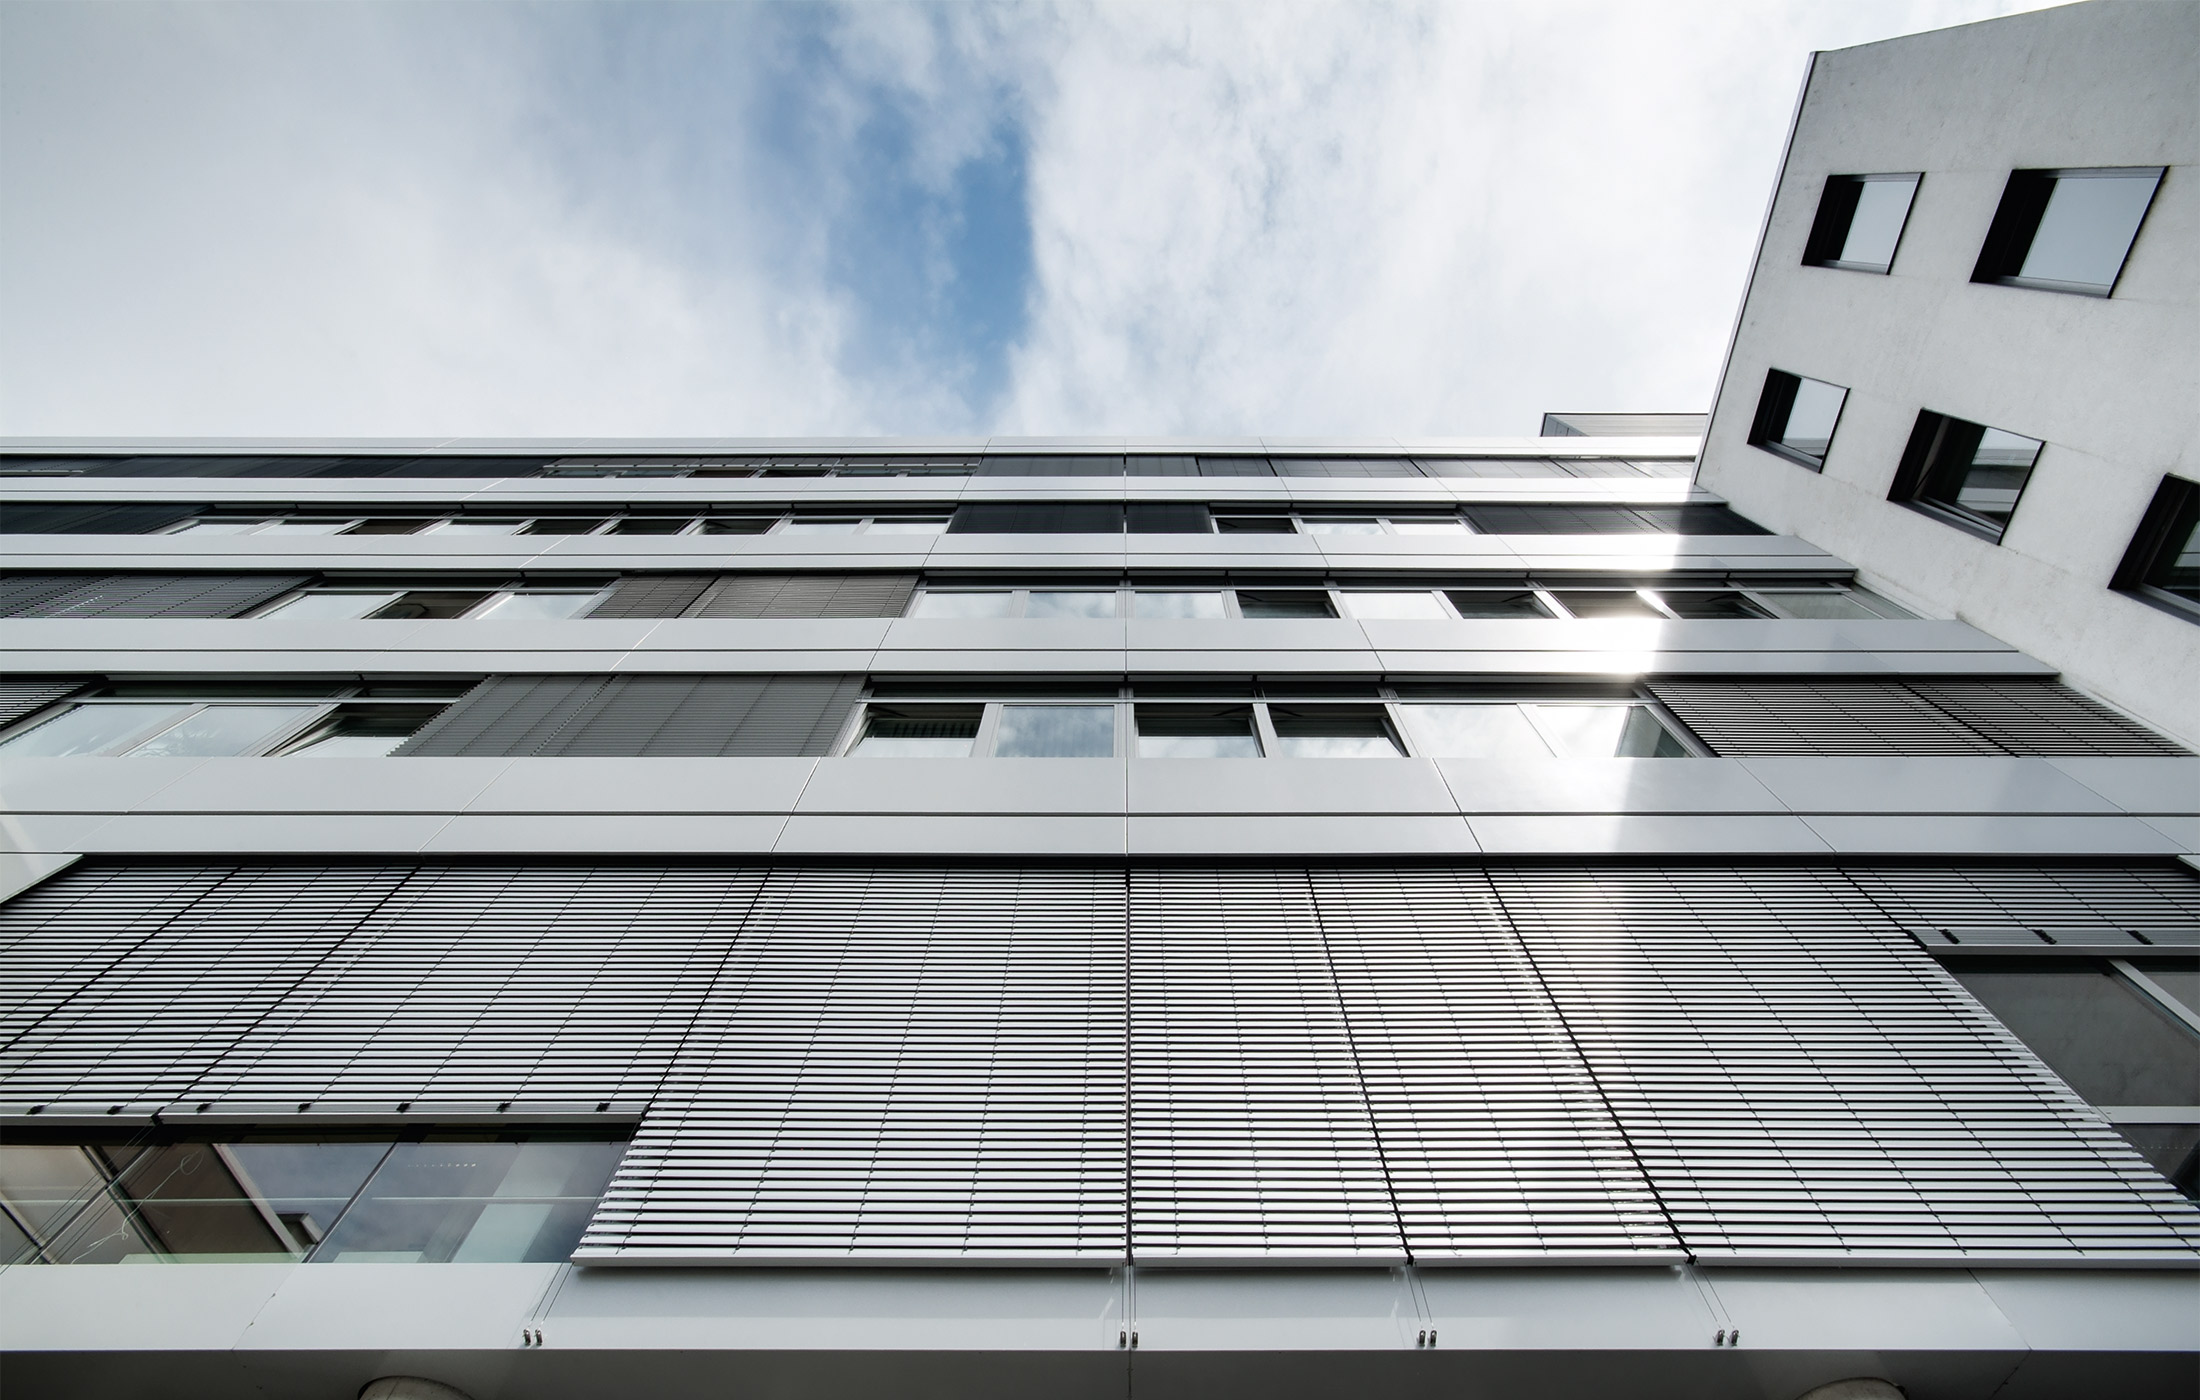 2012, Gesamtsanierung Fassade am Konzernsitz Karlsruhe der EnBW AG